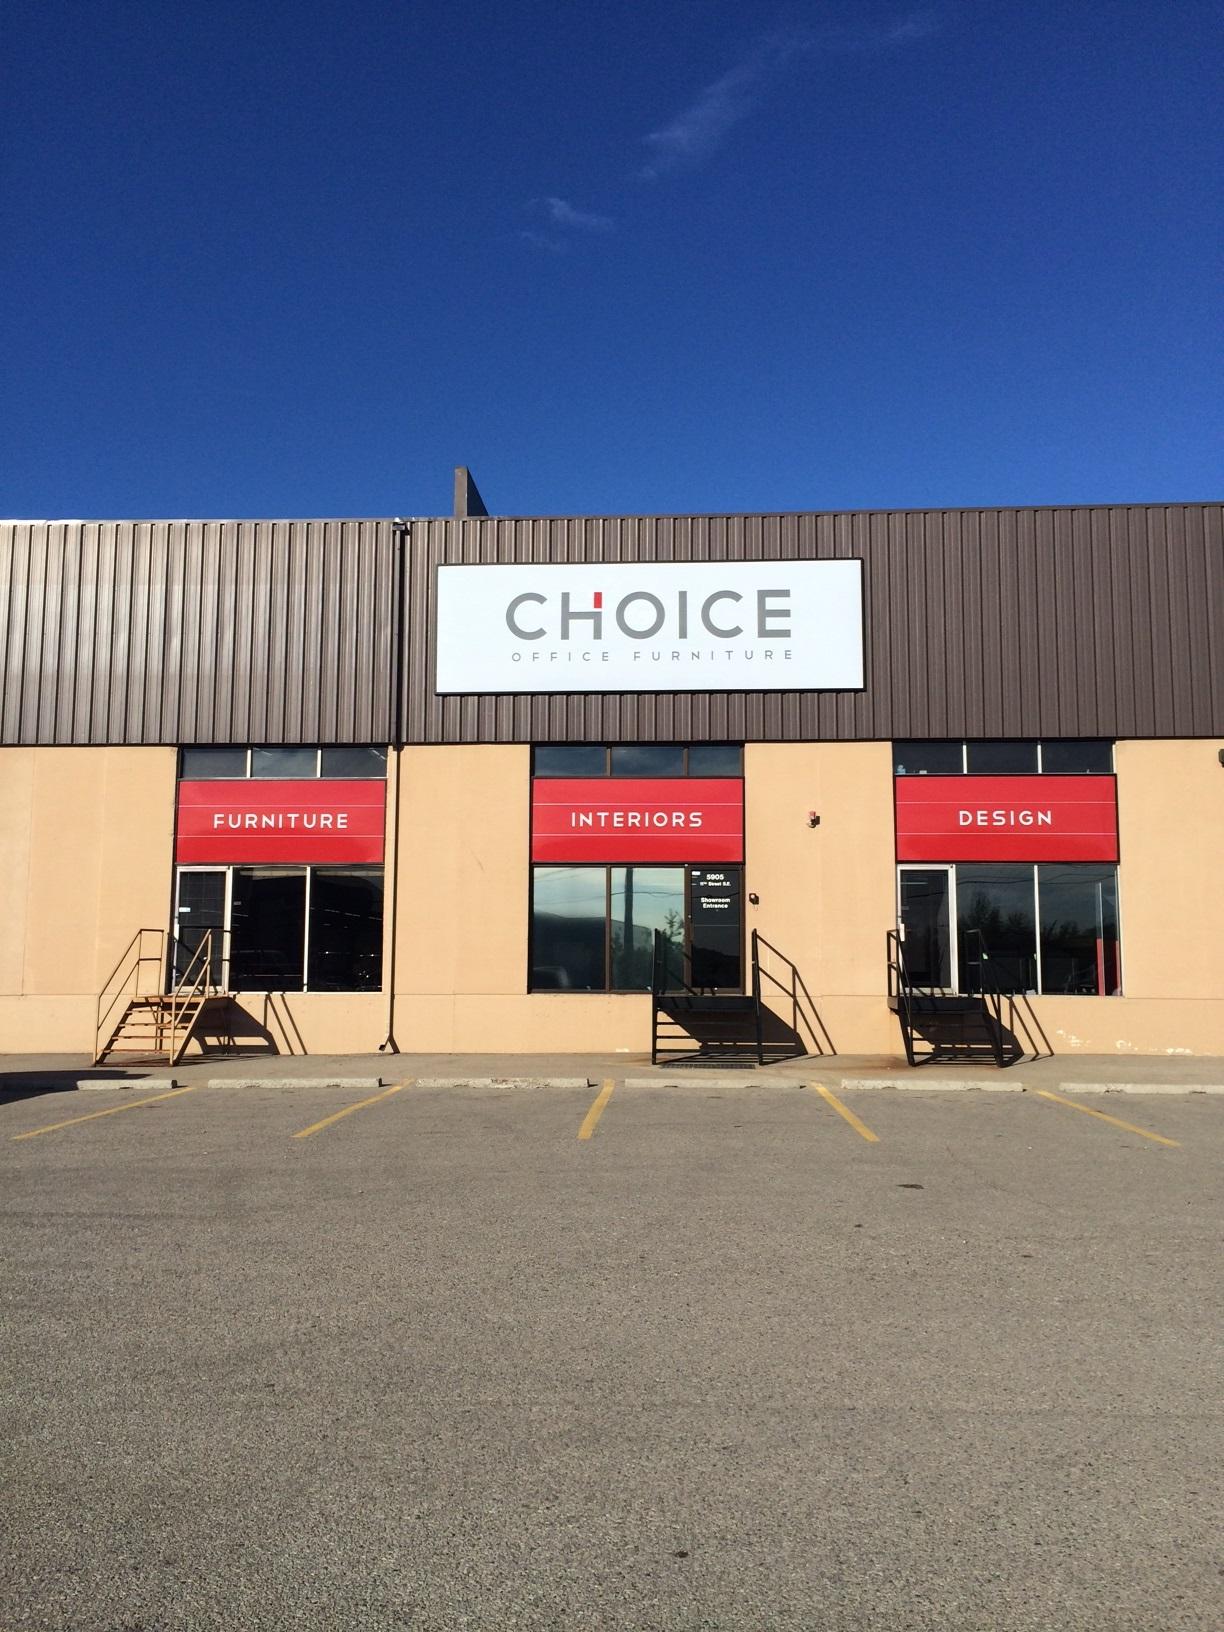 Choice Office Furniture Ltd